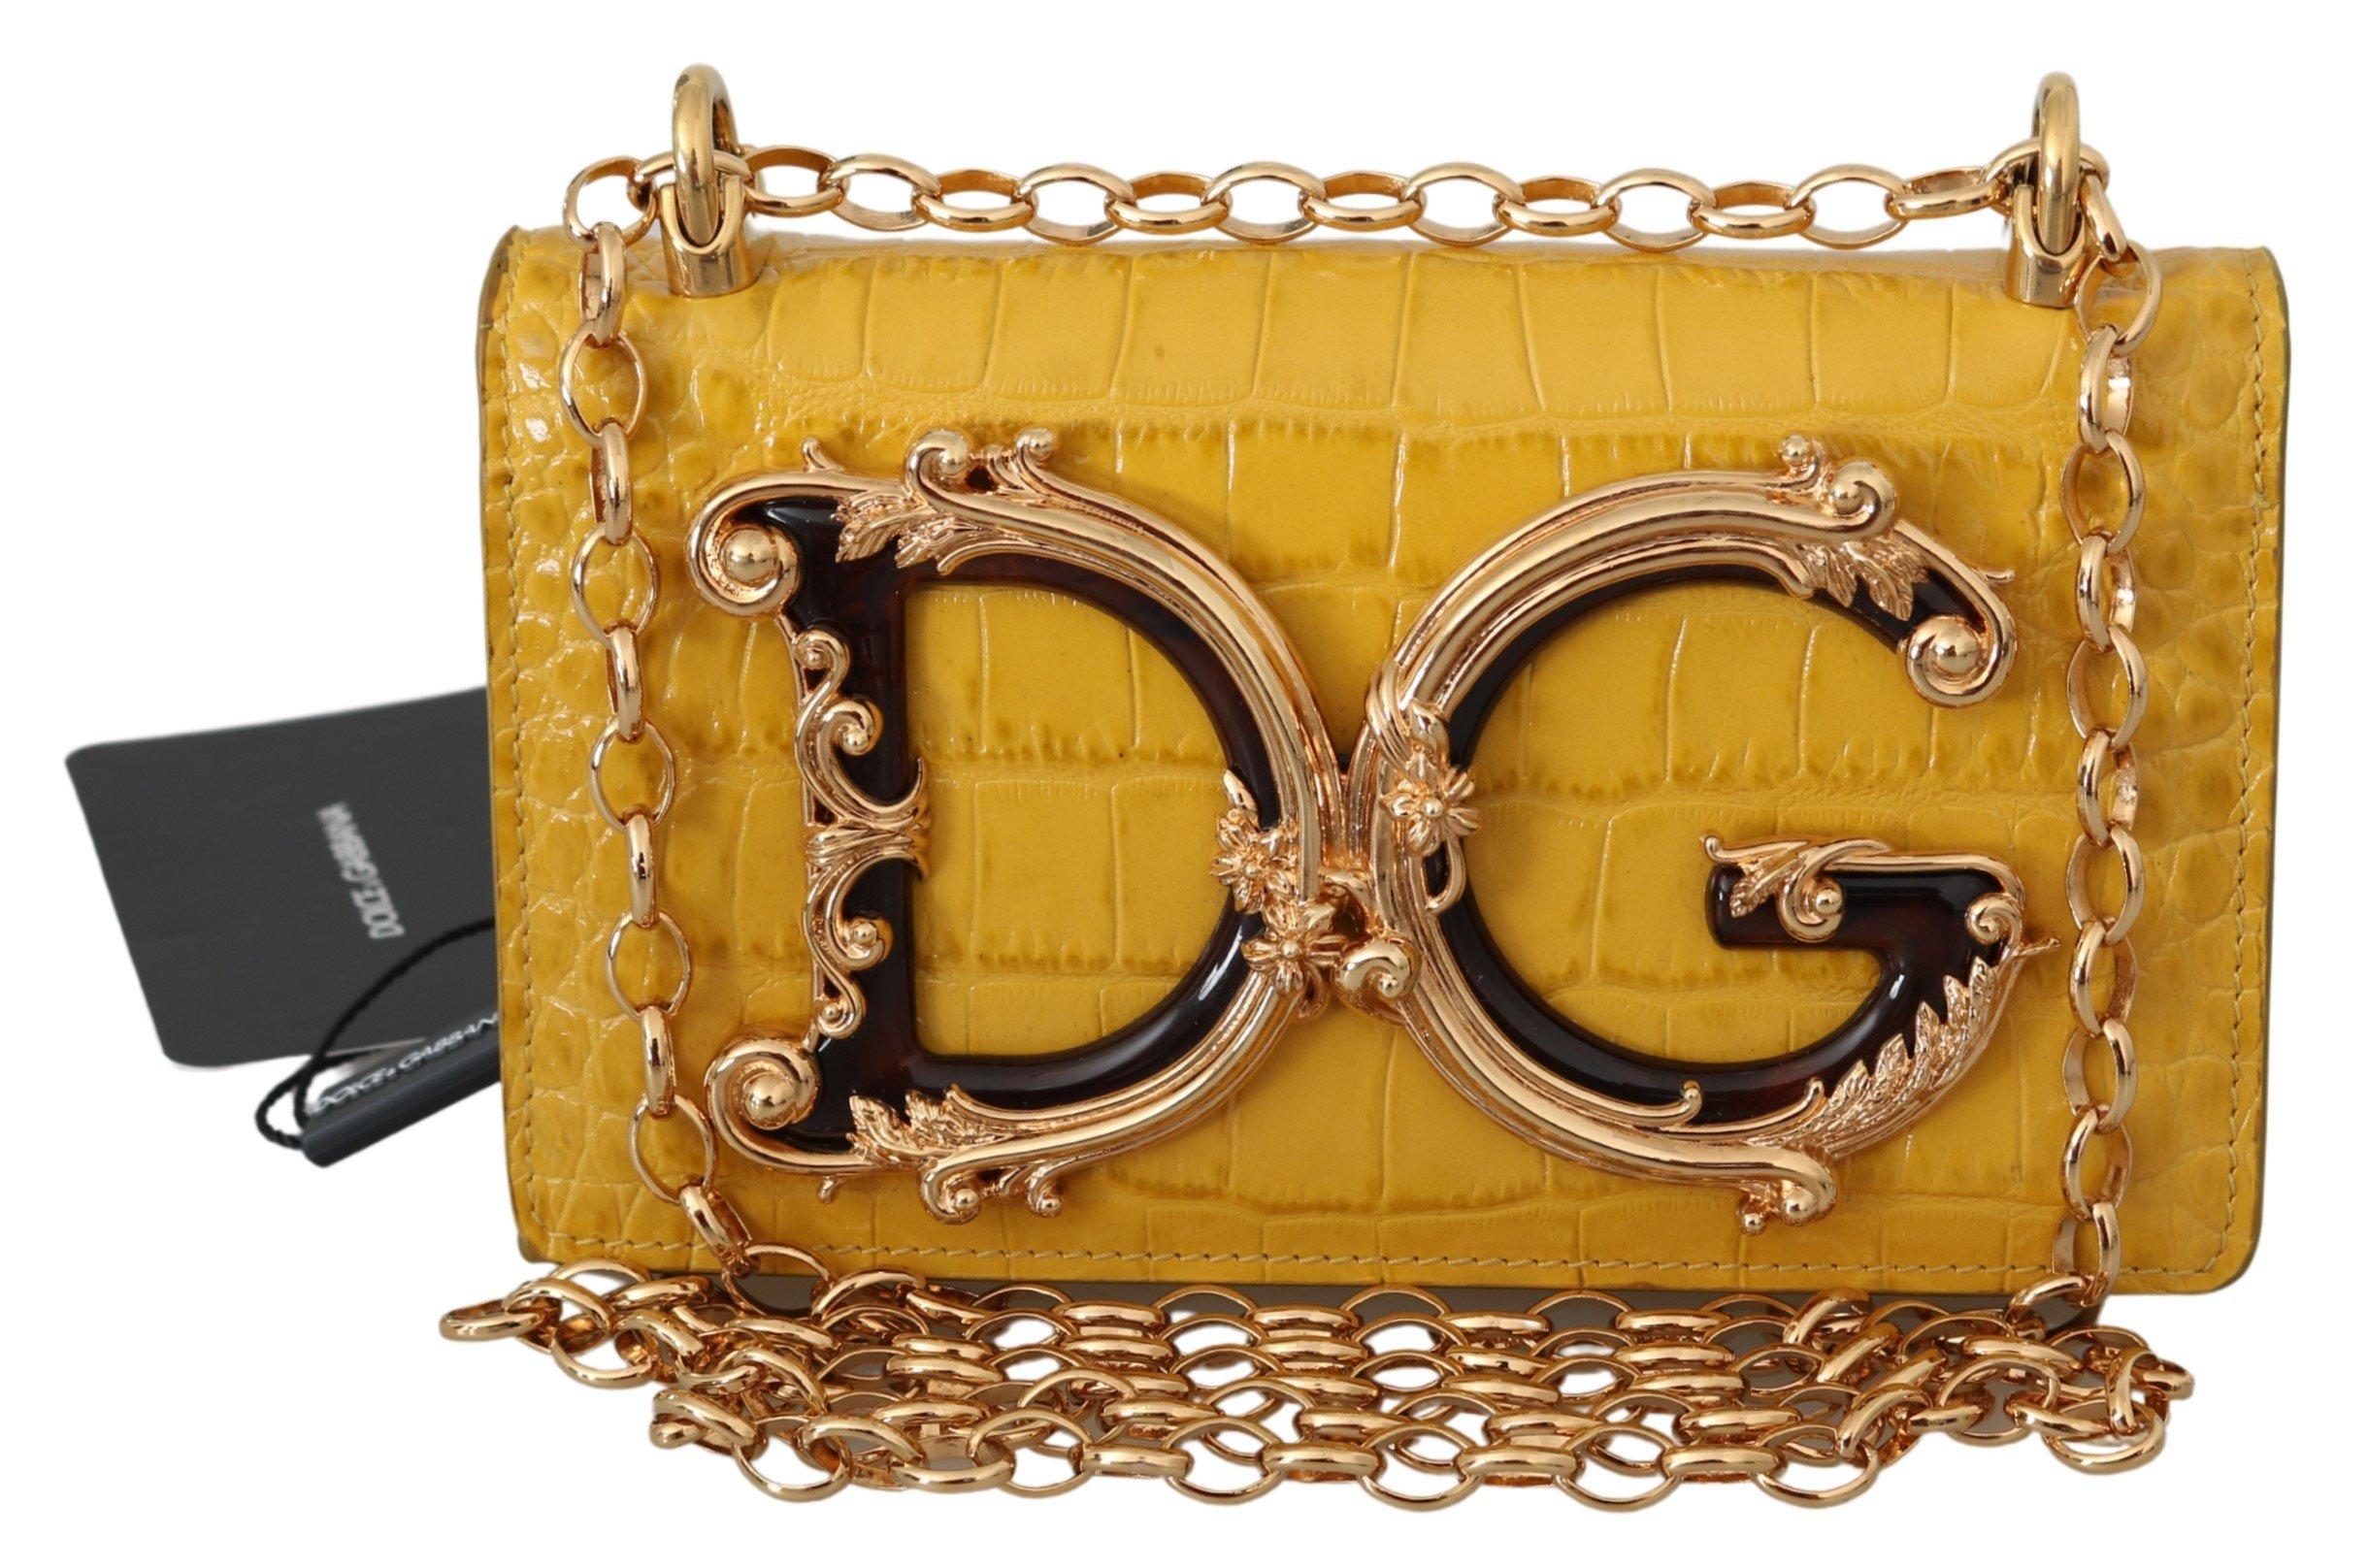 Dolce & Gabbana Women's Leather Logo iPhone X Cover Crossbody Bag Yellow VAS9910